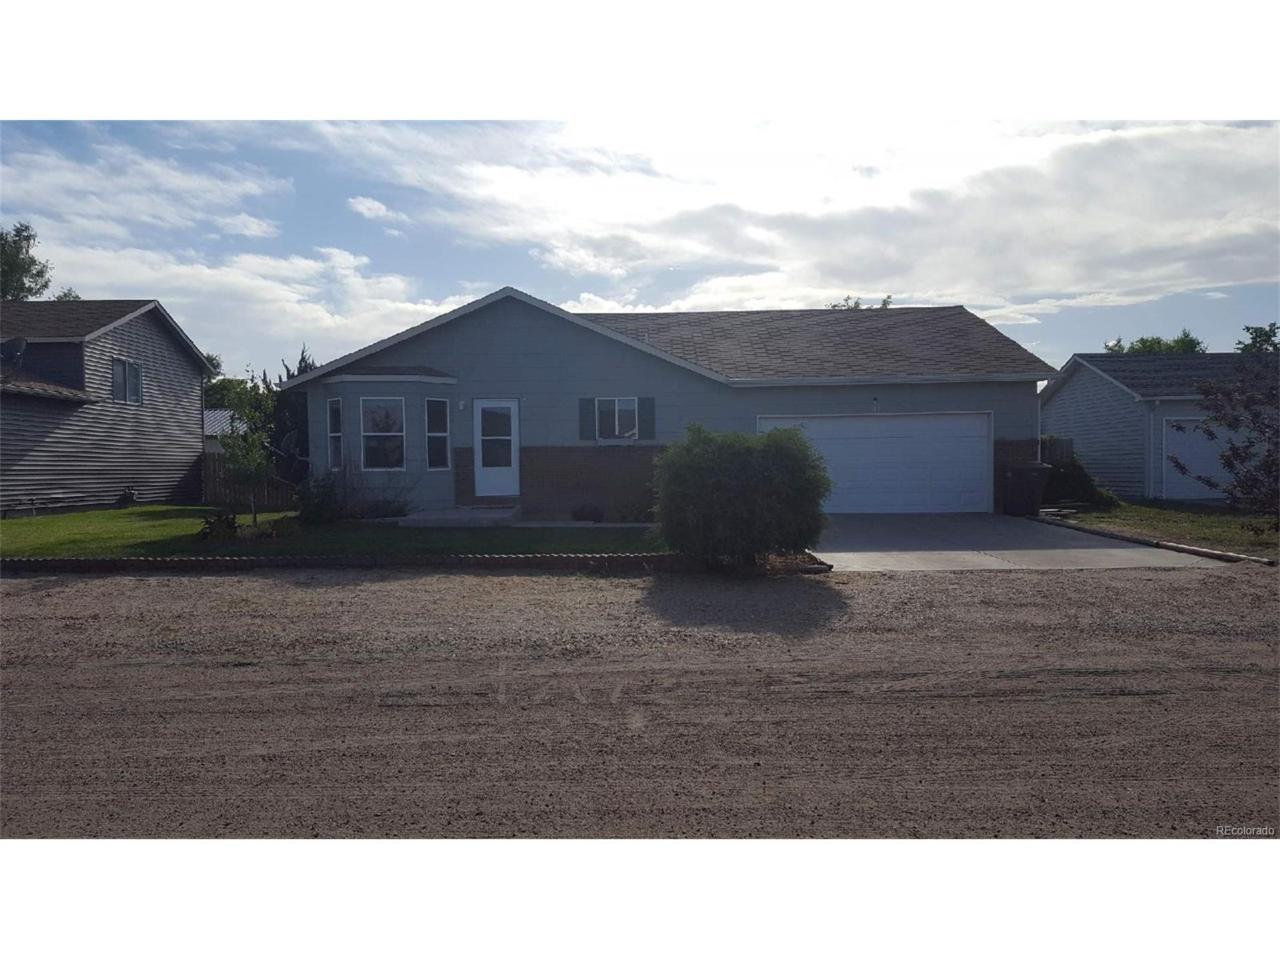 313 Sally Street, Wiggins, CO 80654 (MLS #8018015) :: 8z Real Estate